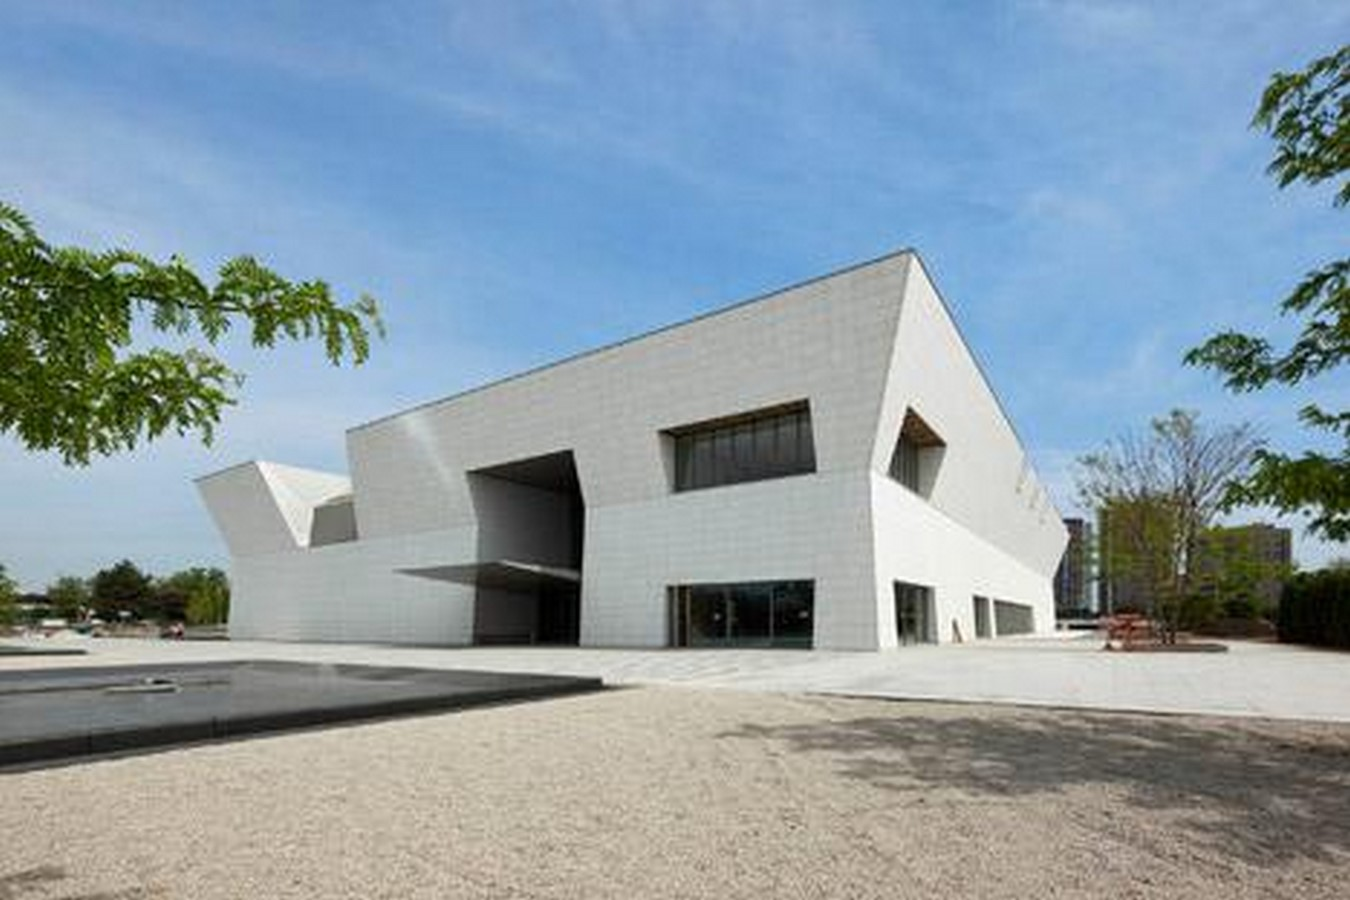 Aga Khan Museum by Fumihiko Maki: Devoted to Islamic art and culture - Sheet2